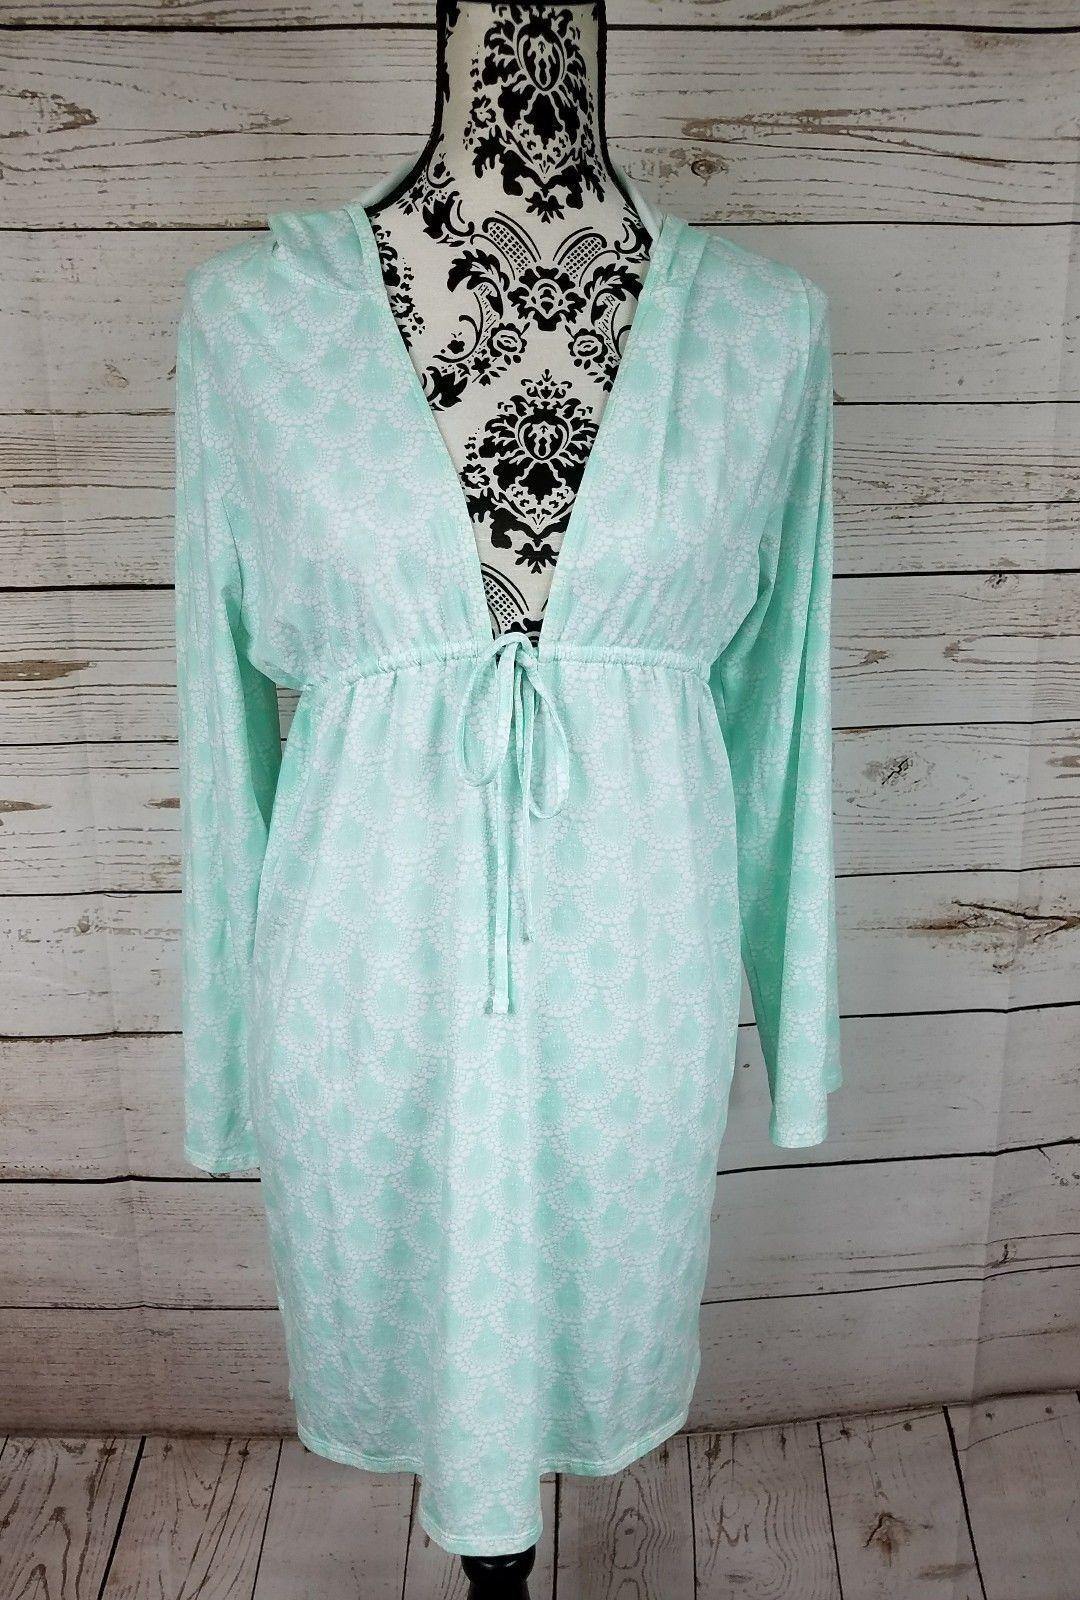 Nwt Peter Millar Grün mit Kapuze Spa Resort Badeanzug Bedeckung Damen XS